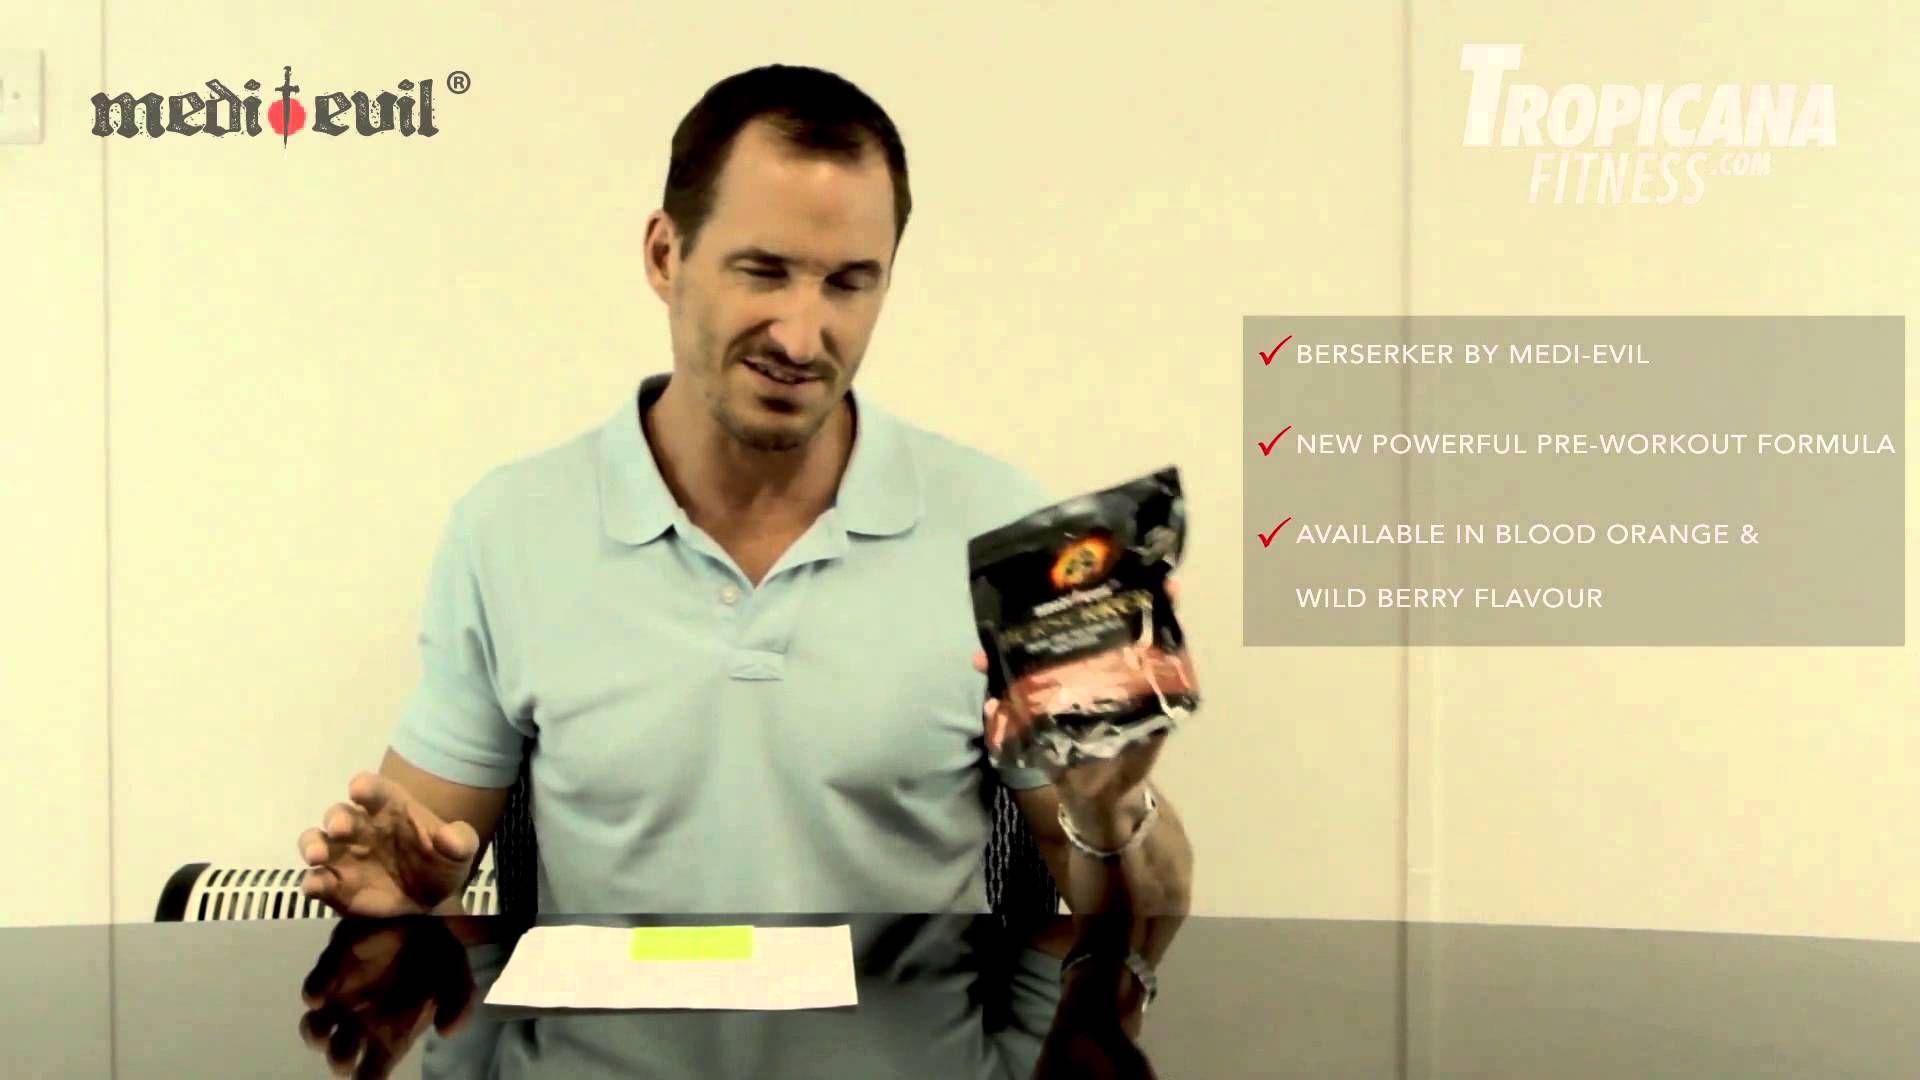 Product Review Of Berserker From Medi Evil By Mark Gilbert Regulatory Affairs Preworkout Evil